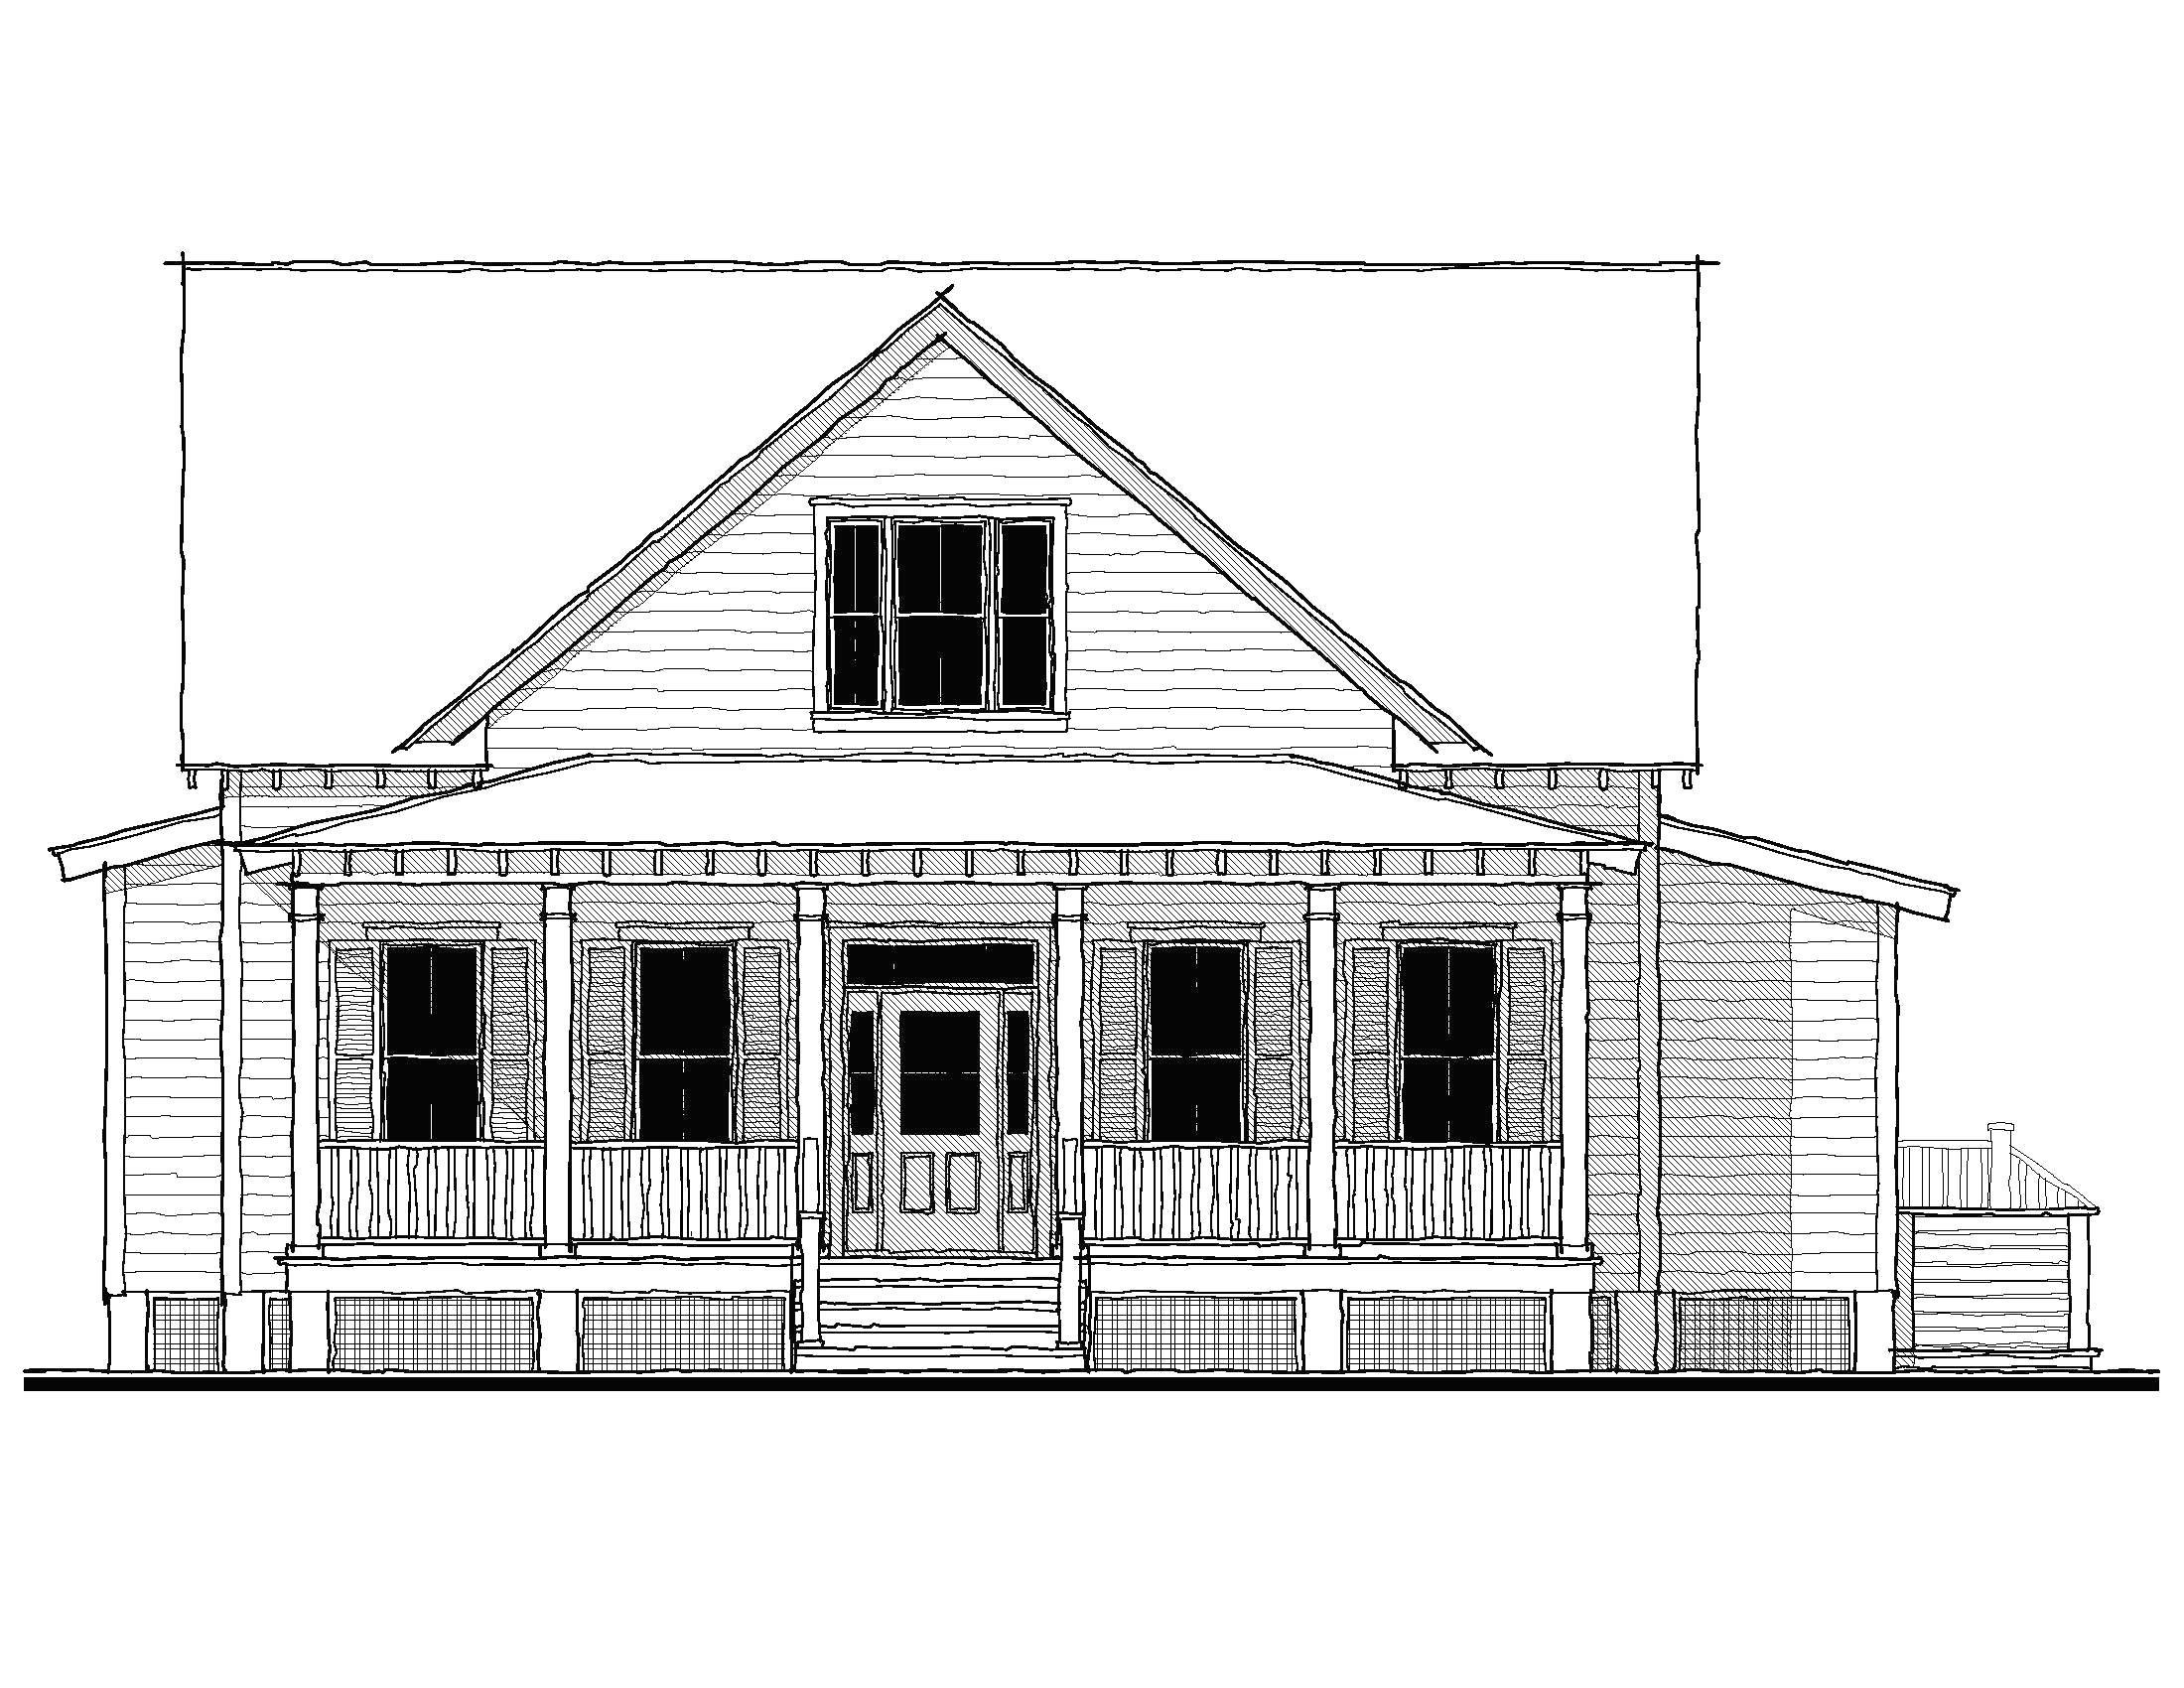 drawings ideas fresh easybuildingplans awesome tumbleweed mica easybuildingplans 0d house